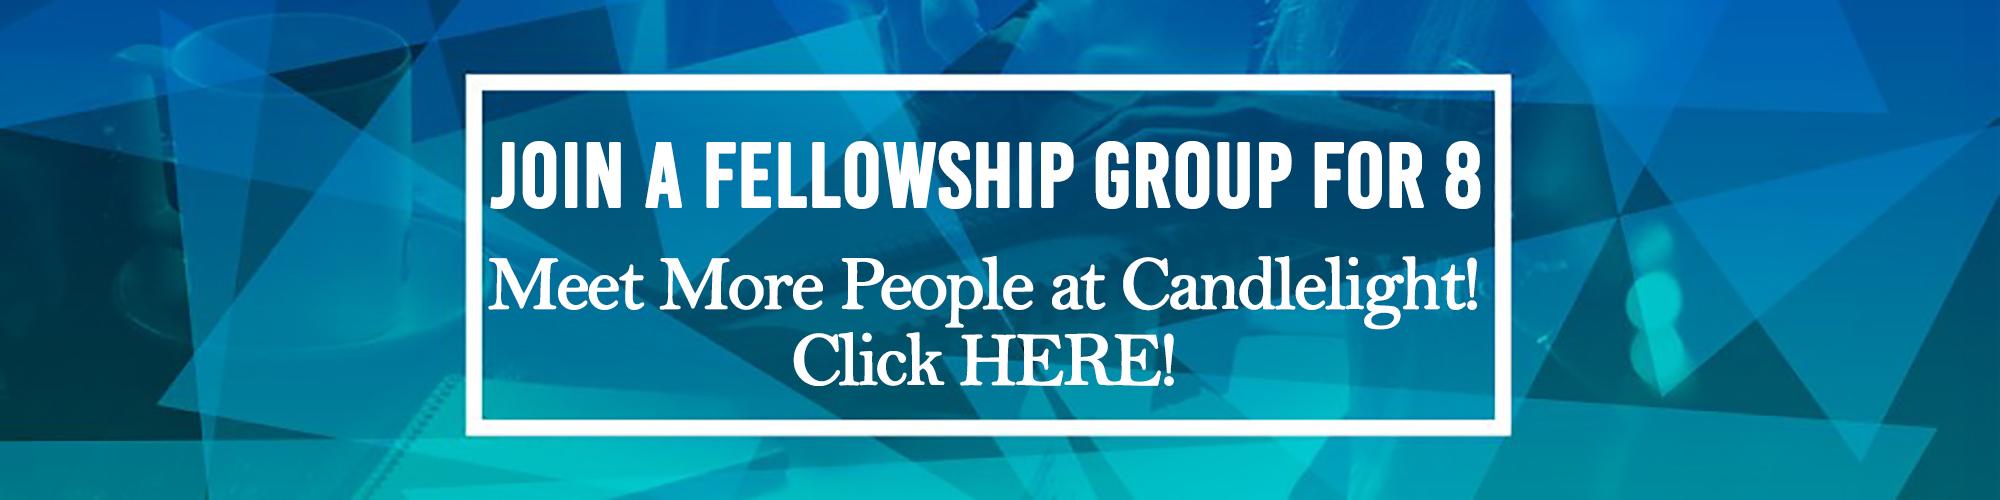 Fellowship-for-8